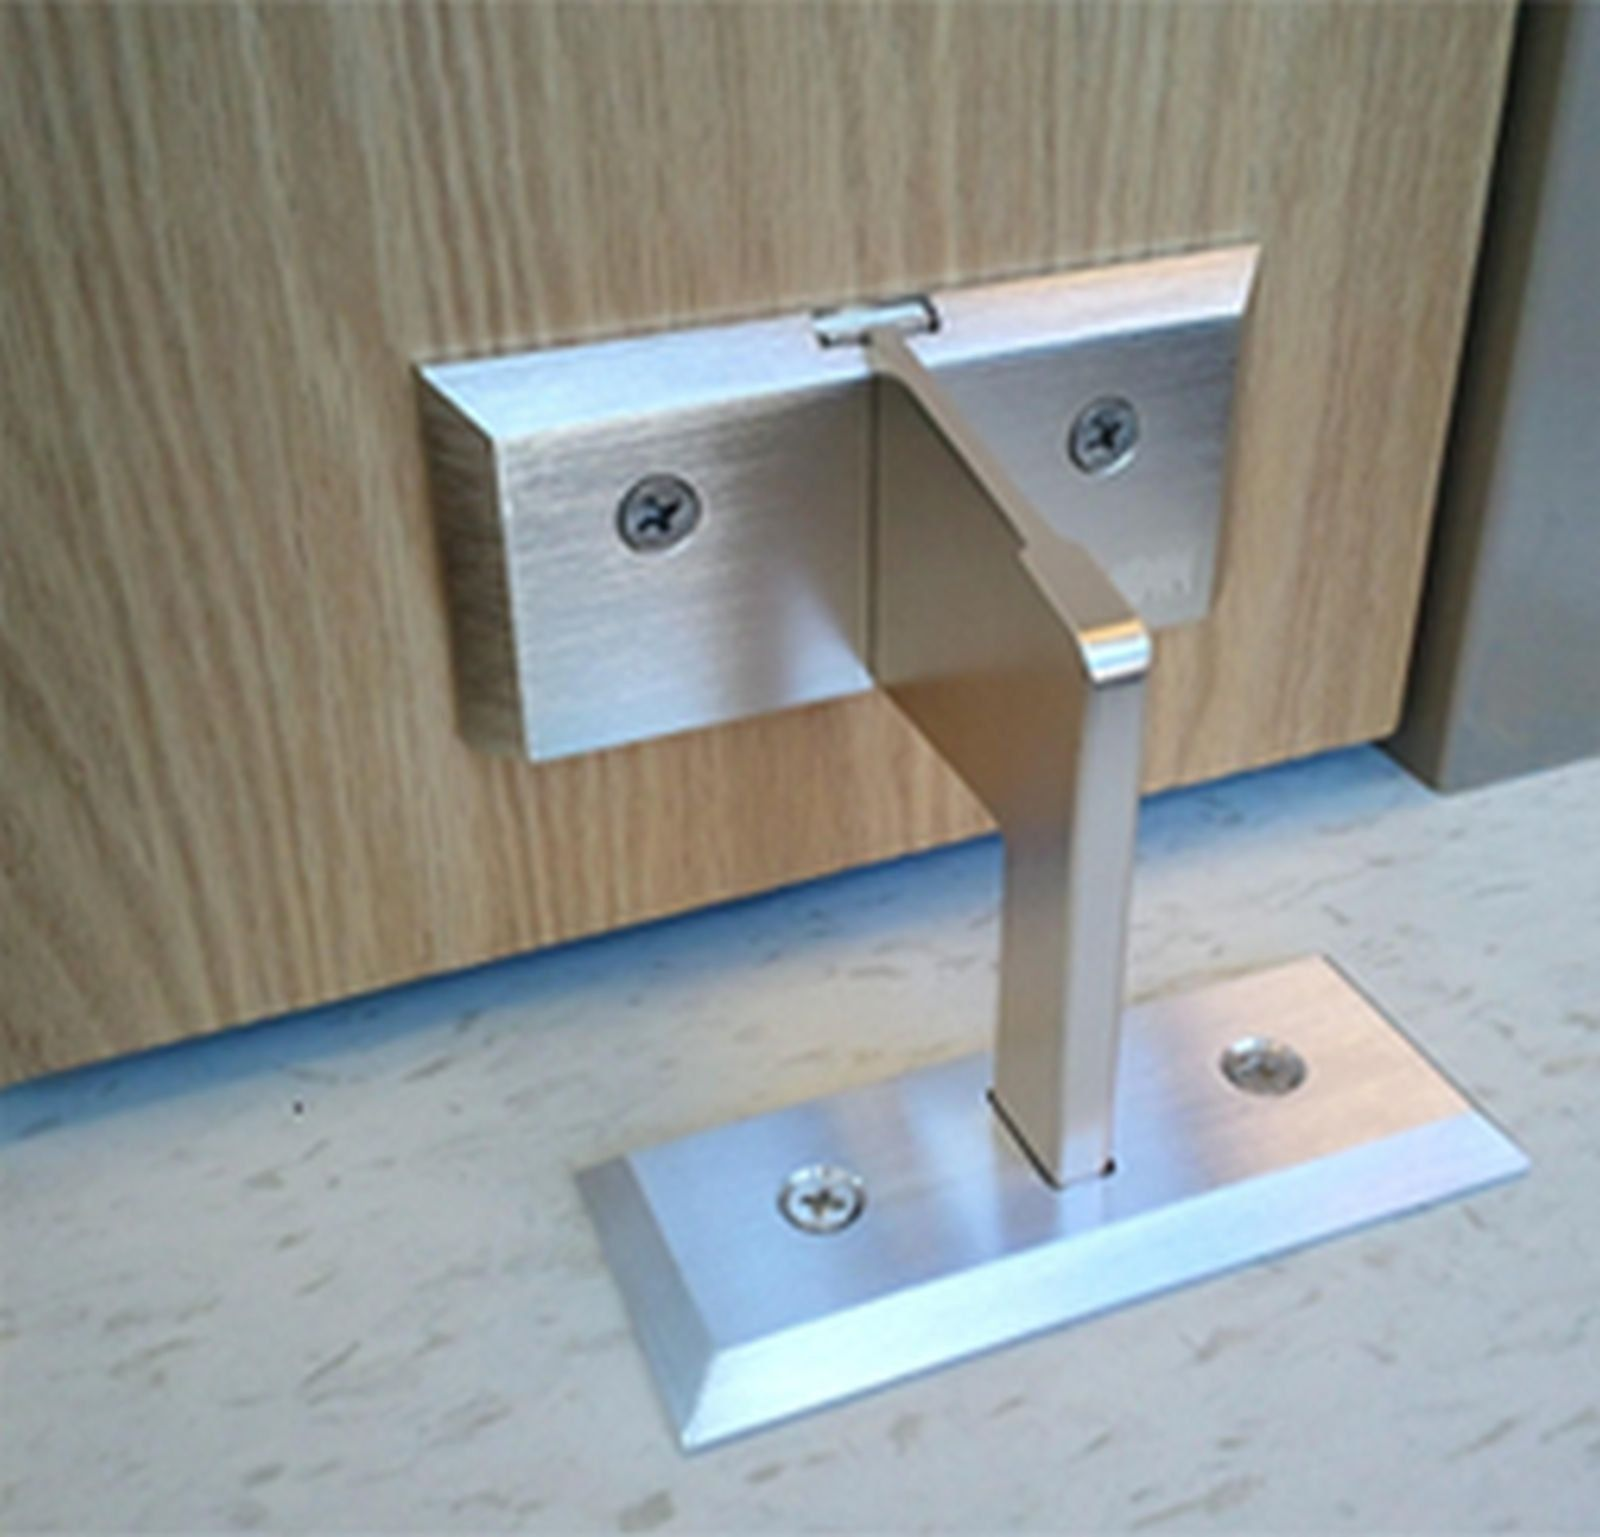 Nightlock Residential Door Lock Barricade Gignius Home Security Tips Residential Doors Home Safety